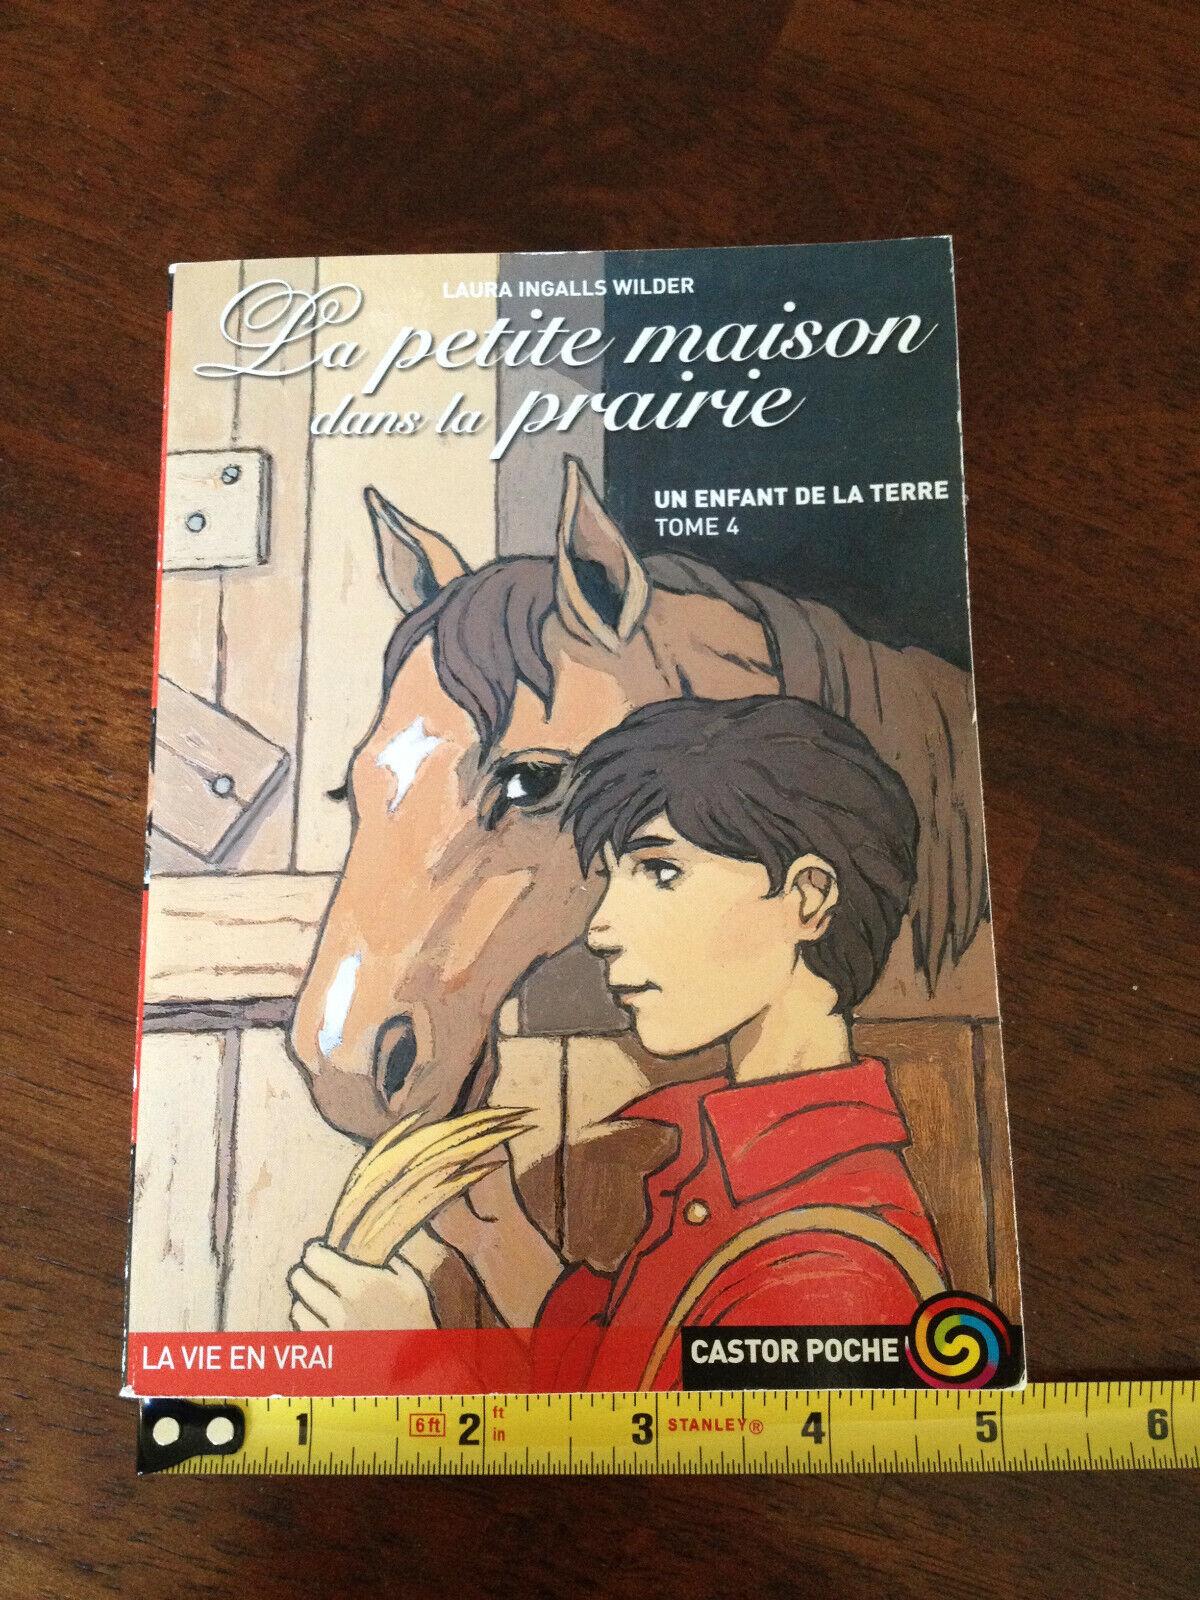 Laura Petite Maison Dans La Prairie : laura, petite, maison, prairie, Petite, Maison, Prairie., Enfant, Terre., Laura, Ingalls, Online